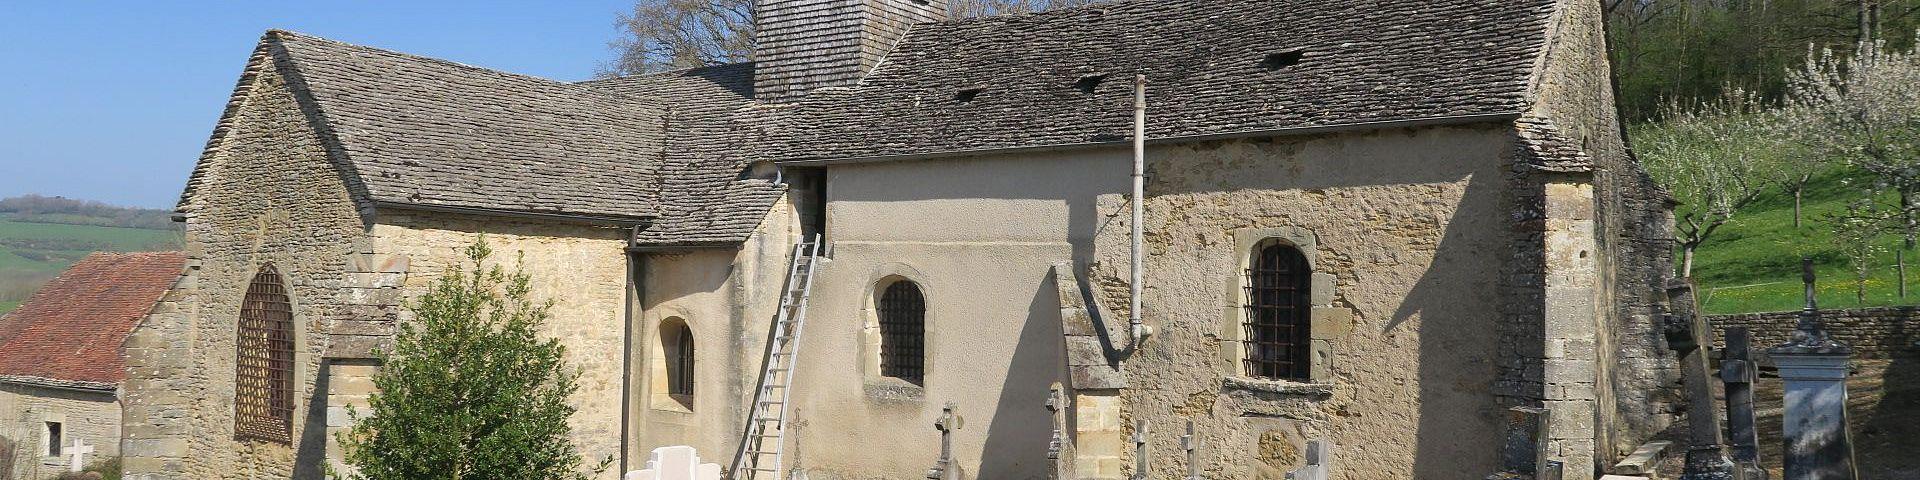 Velogny - Eglise Saint-Nicolas (21)